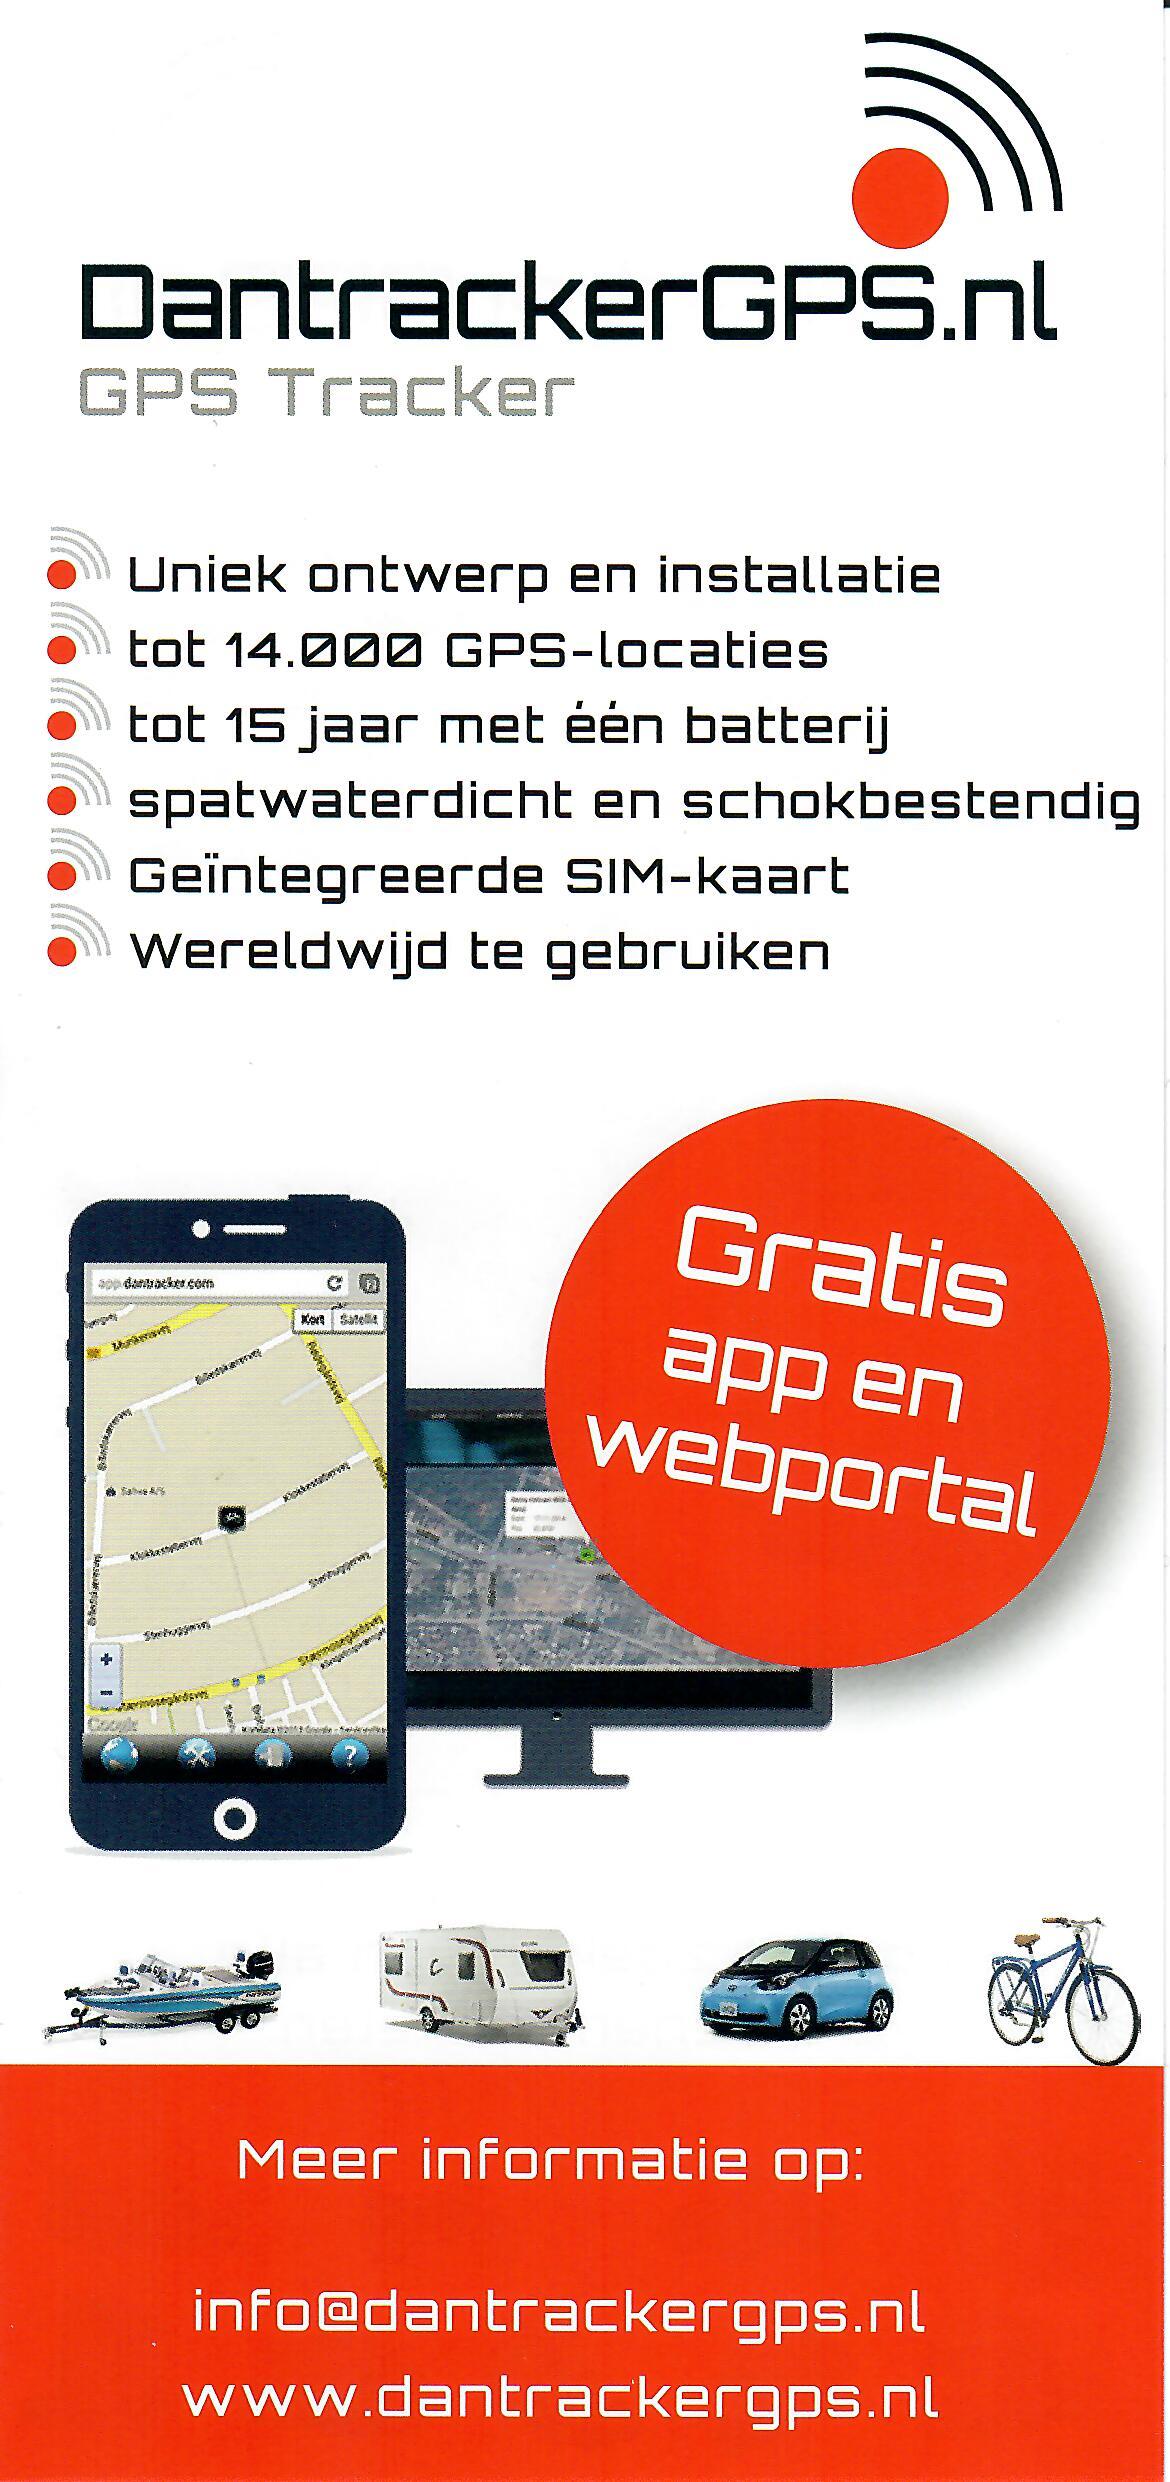 Dantrackergps.nl GPS